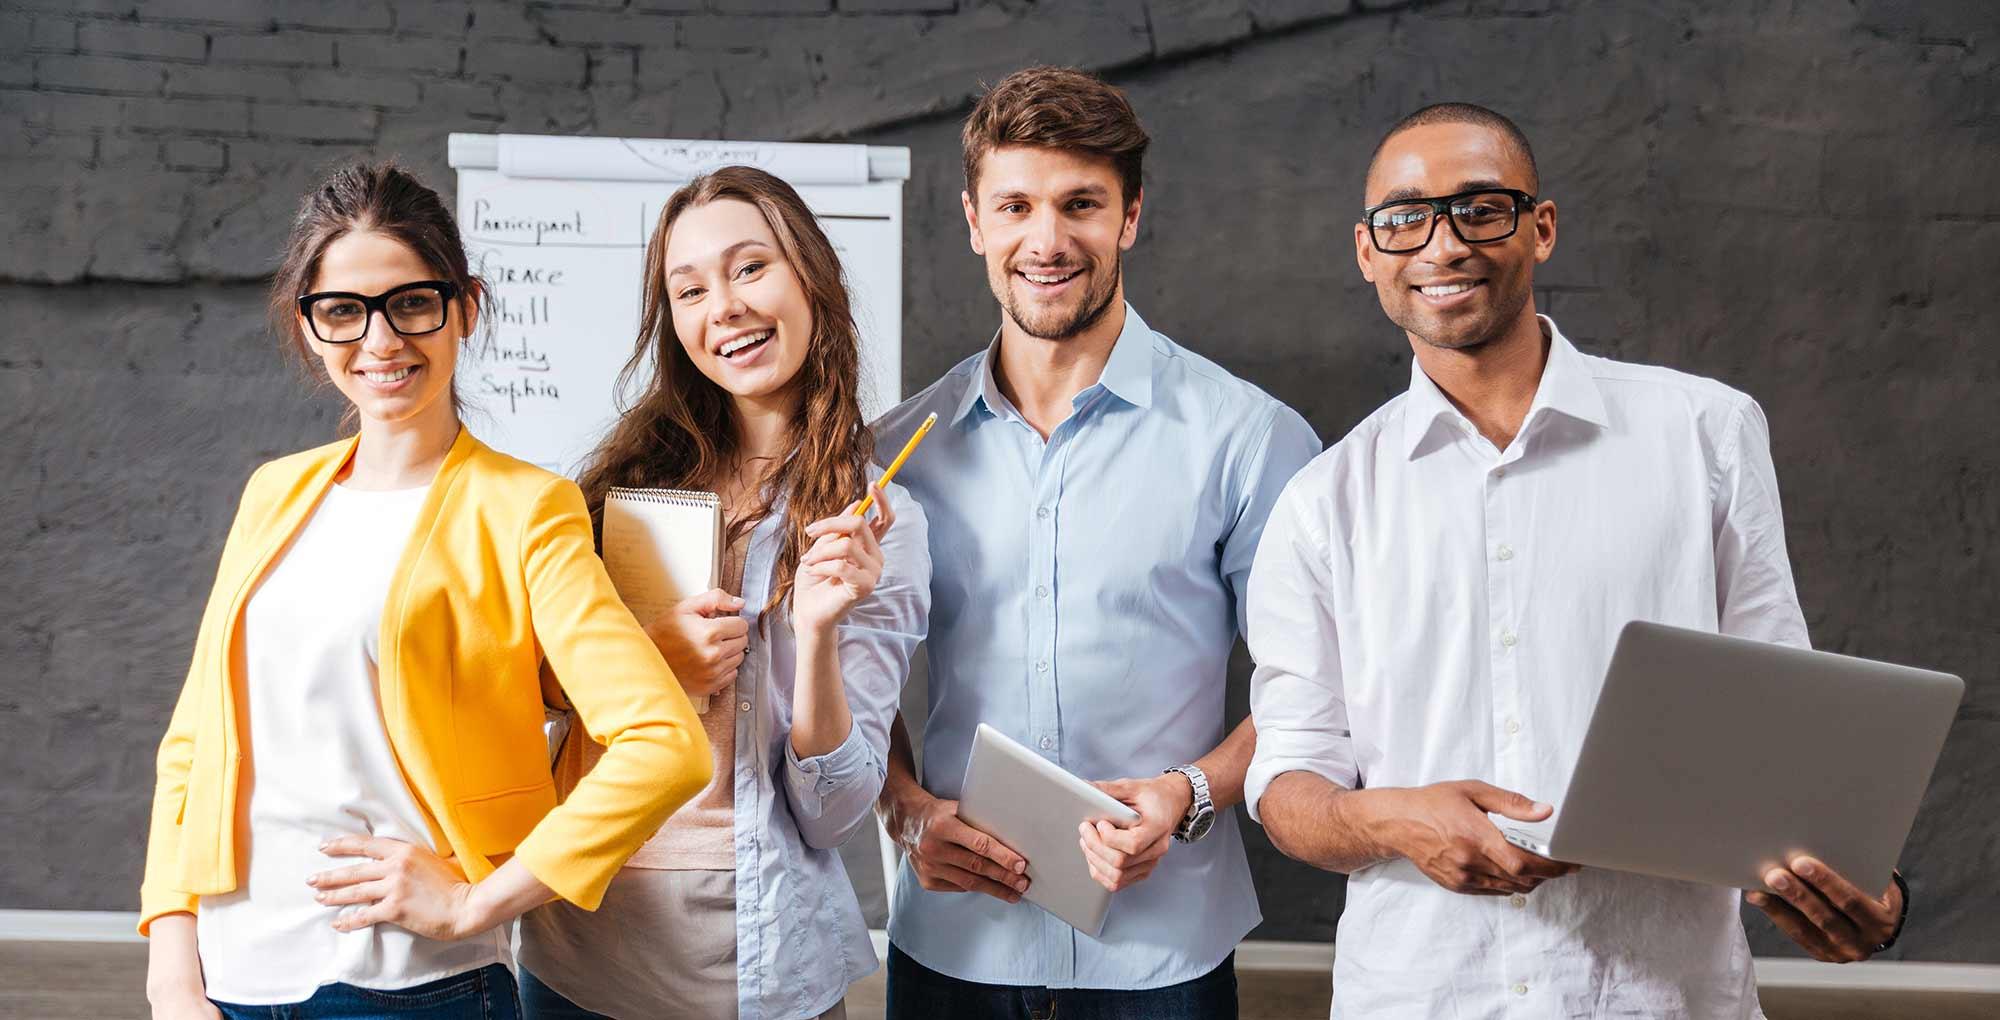 5 Inbound Sales Tactics Your Sales Team Could Start Using Today